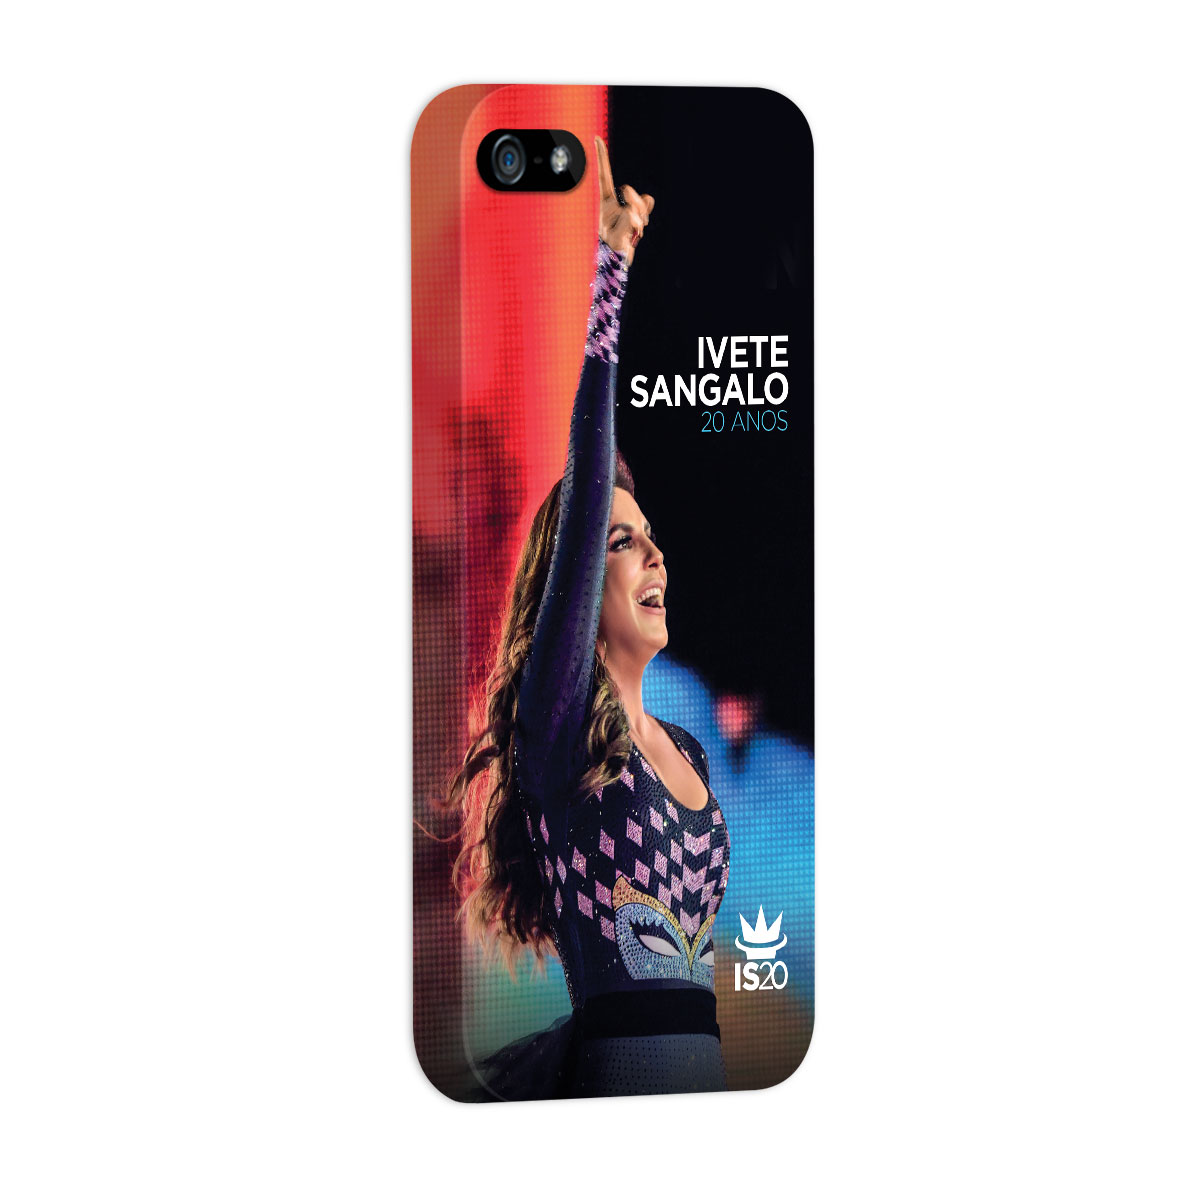 Capa para iPhone 5/5S Ivete Sangalo Capa 20 Anos